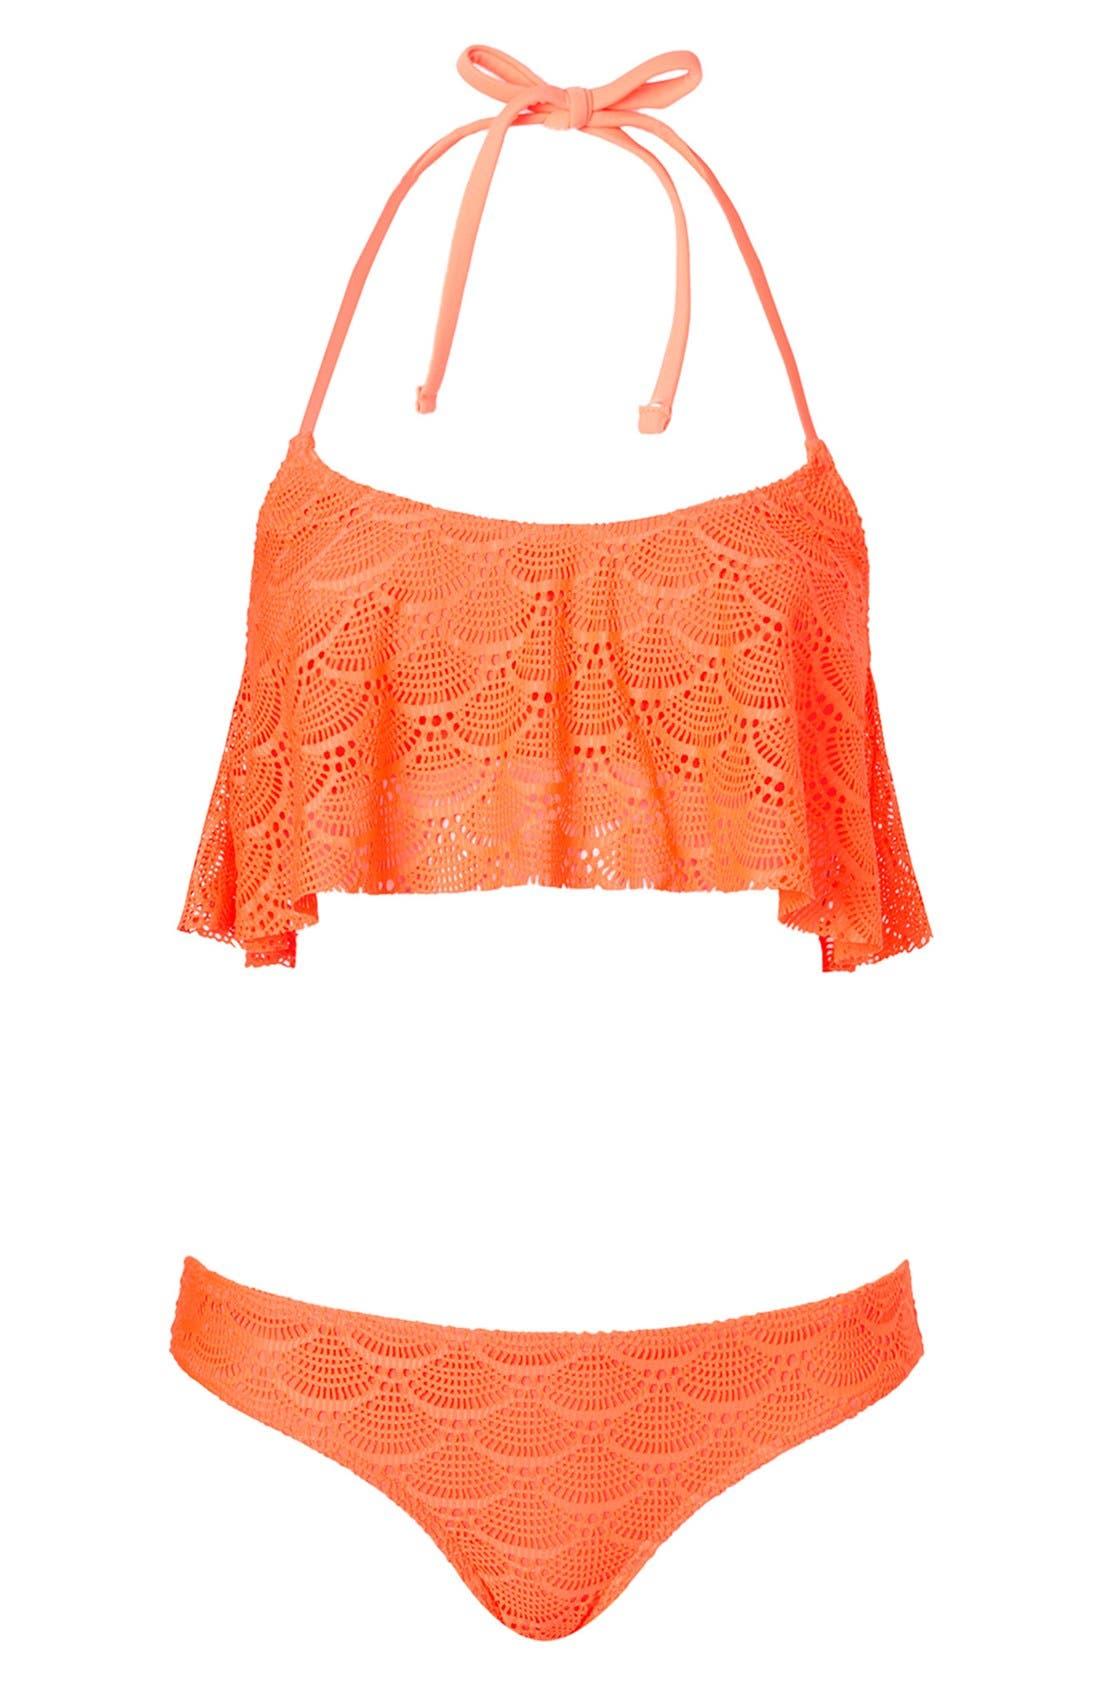 Alternate Image 1 Selected - Topshop Crochet Bikini Set